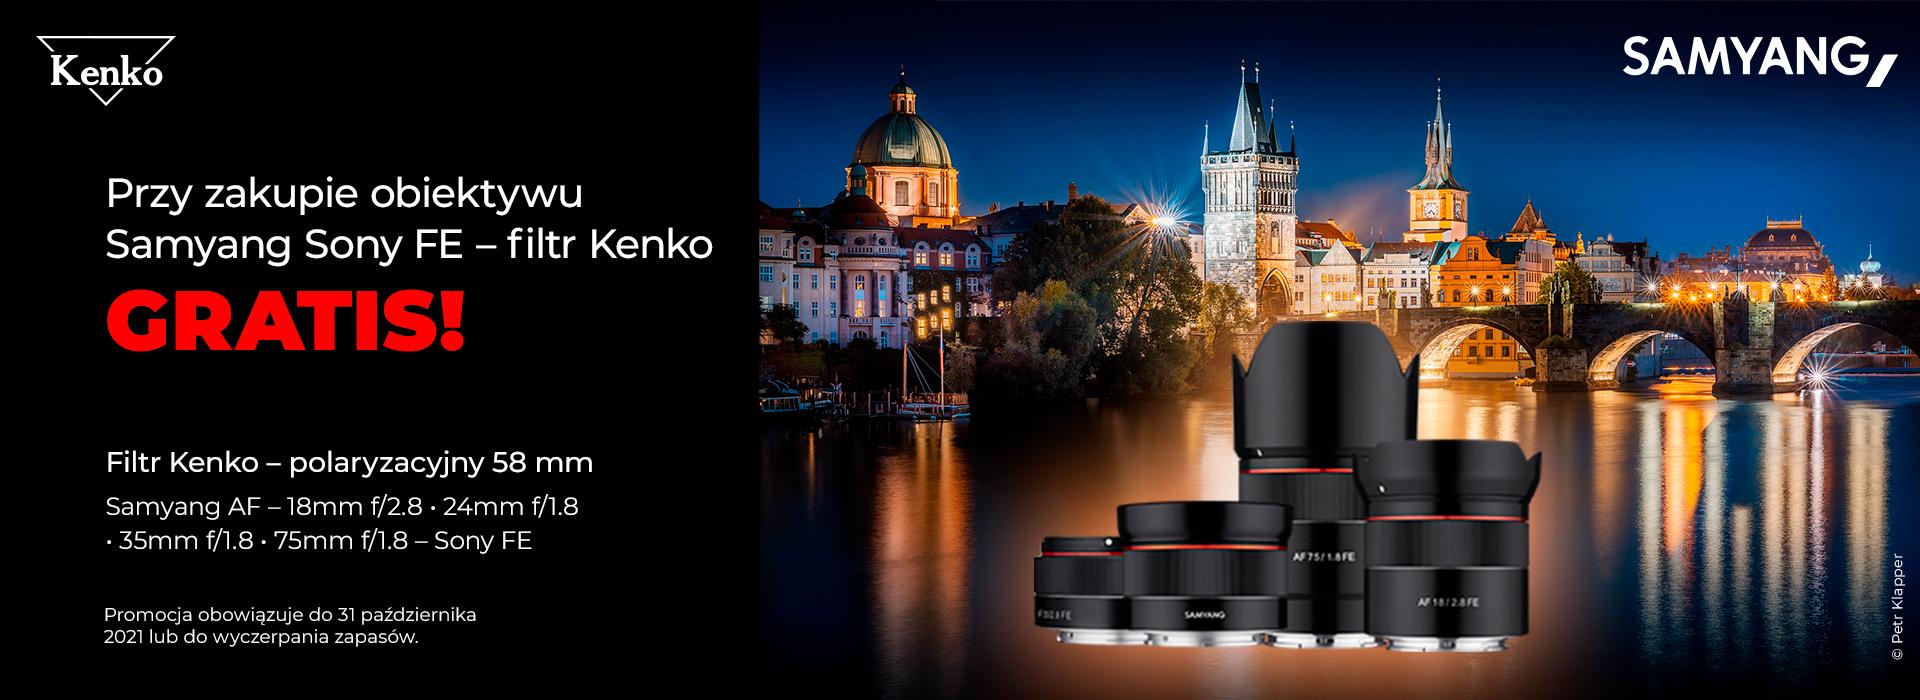 Samyang - filtr Kenko 58mm GRATIS